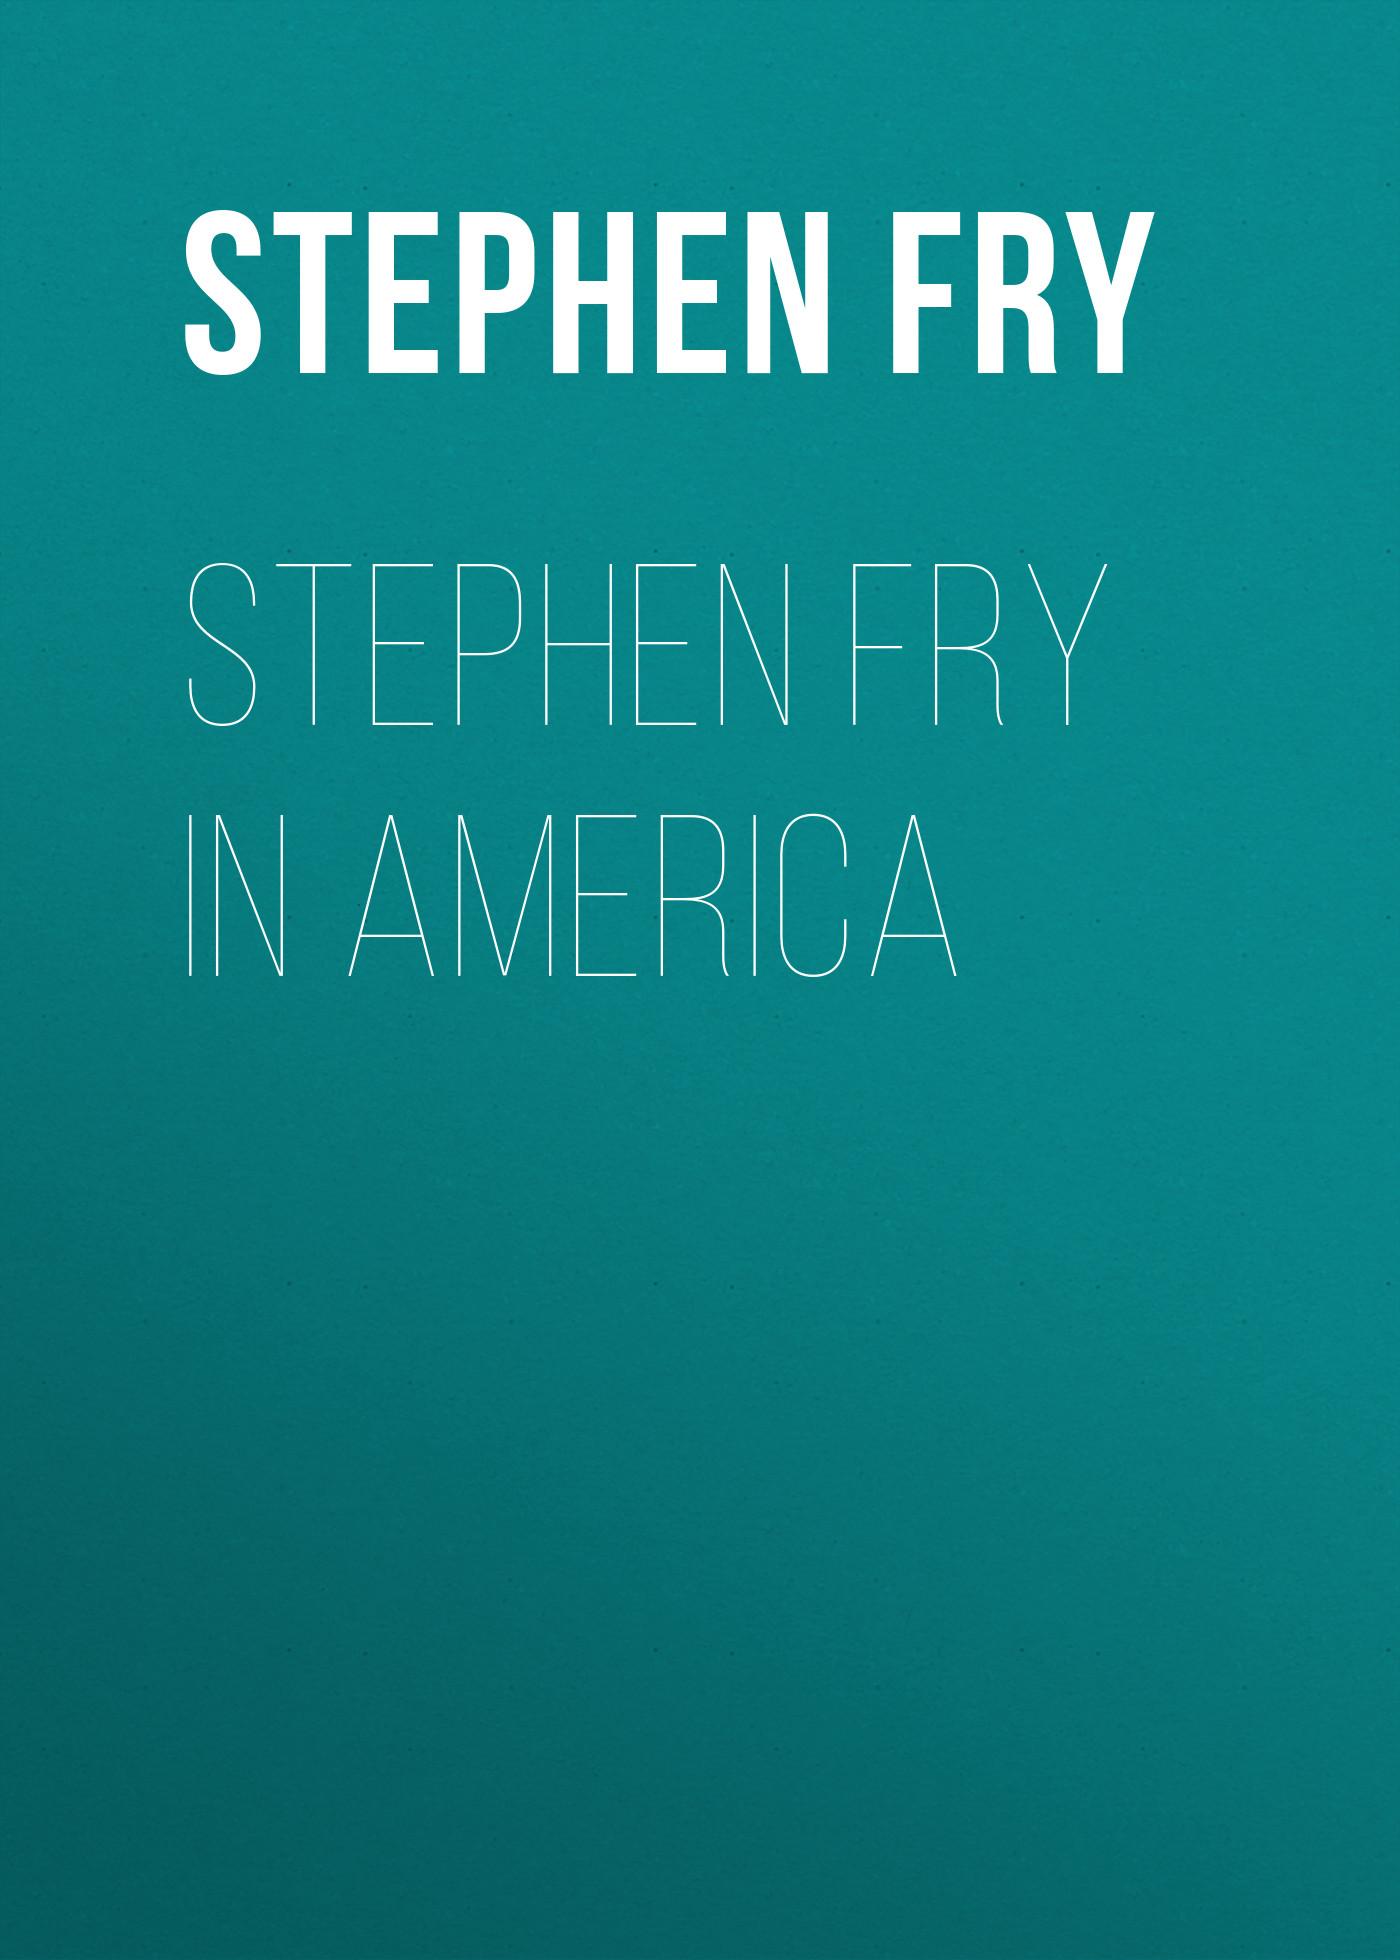 Stephen Fry Stephen Fry In America stephen bilunka sunset illusions